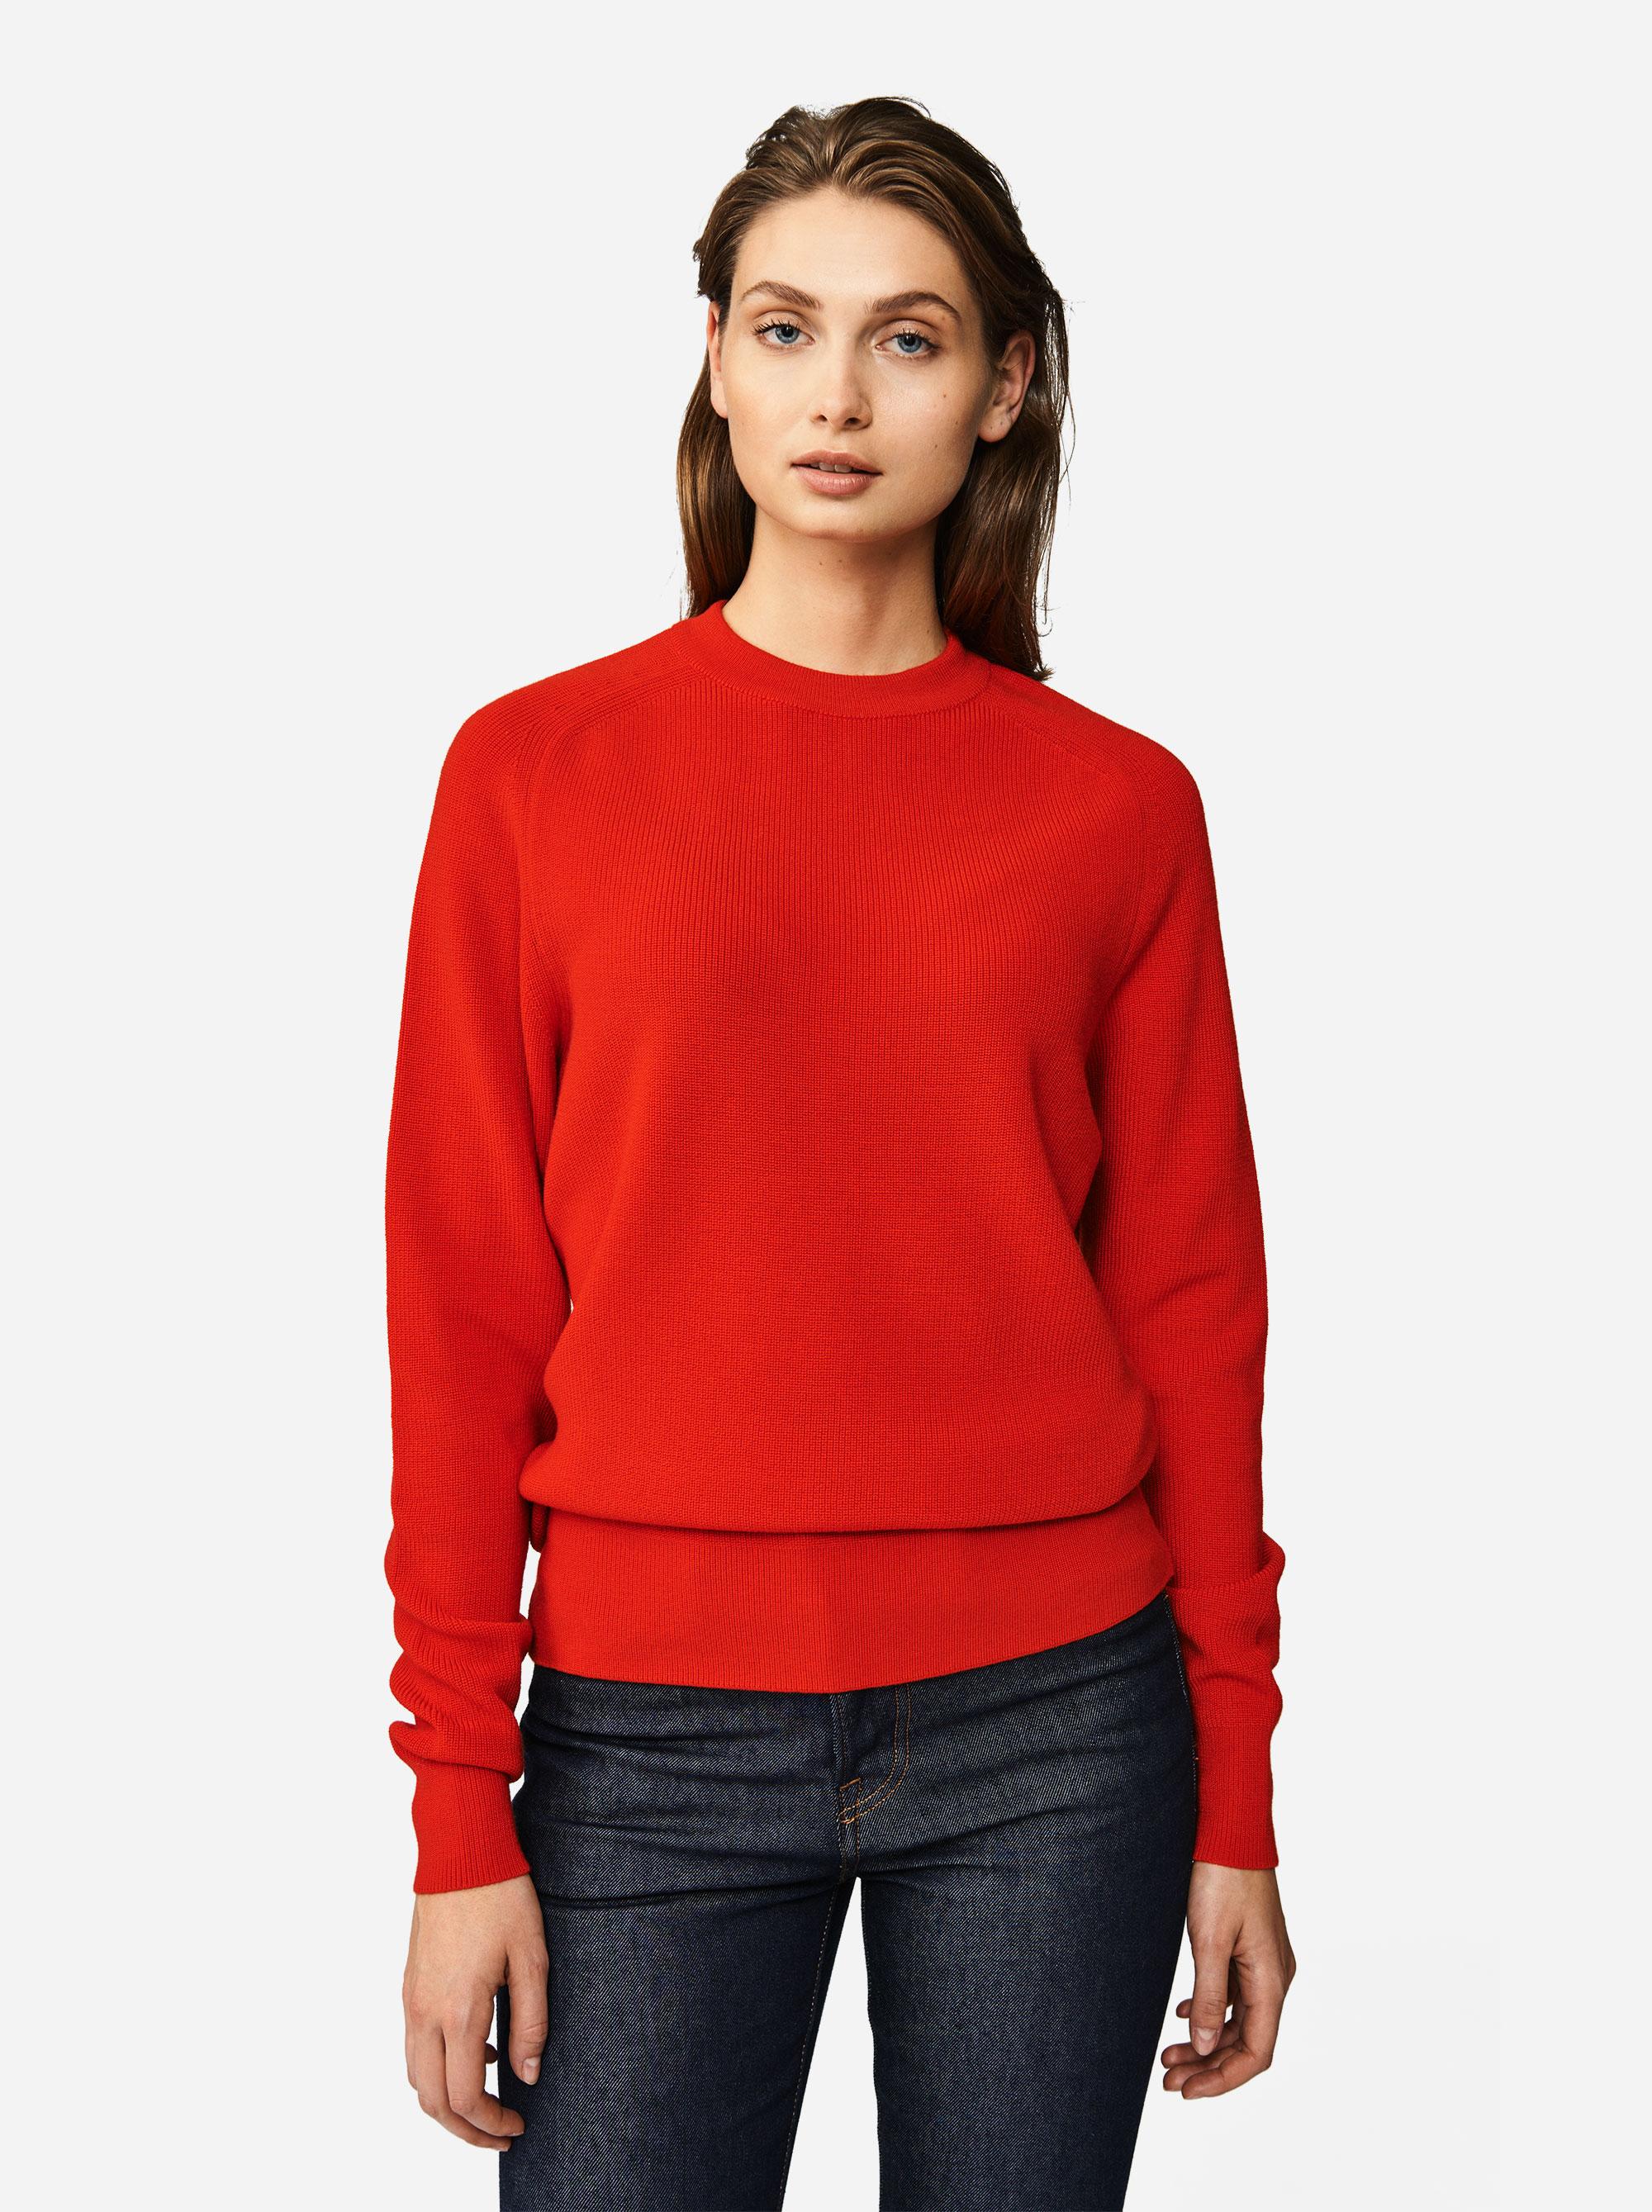 Teym - Crewneck - The Merino Sweater - Women - Red - 3